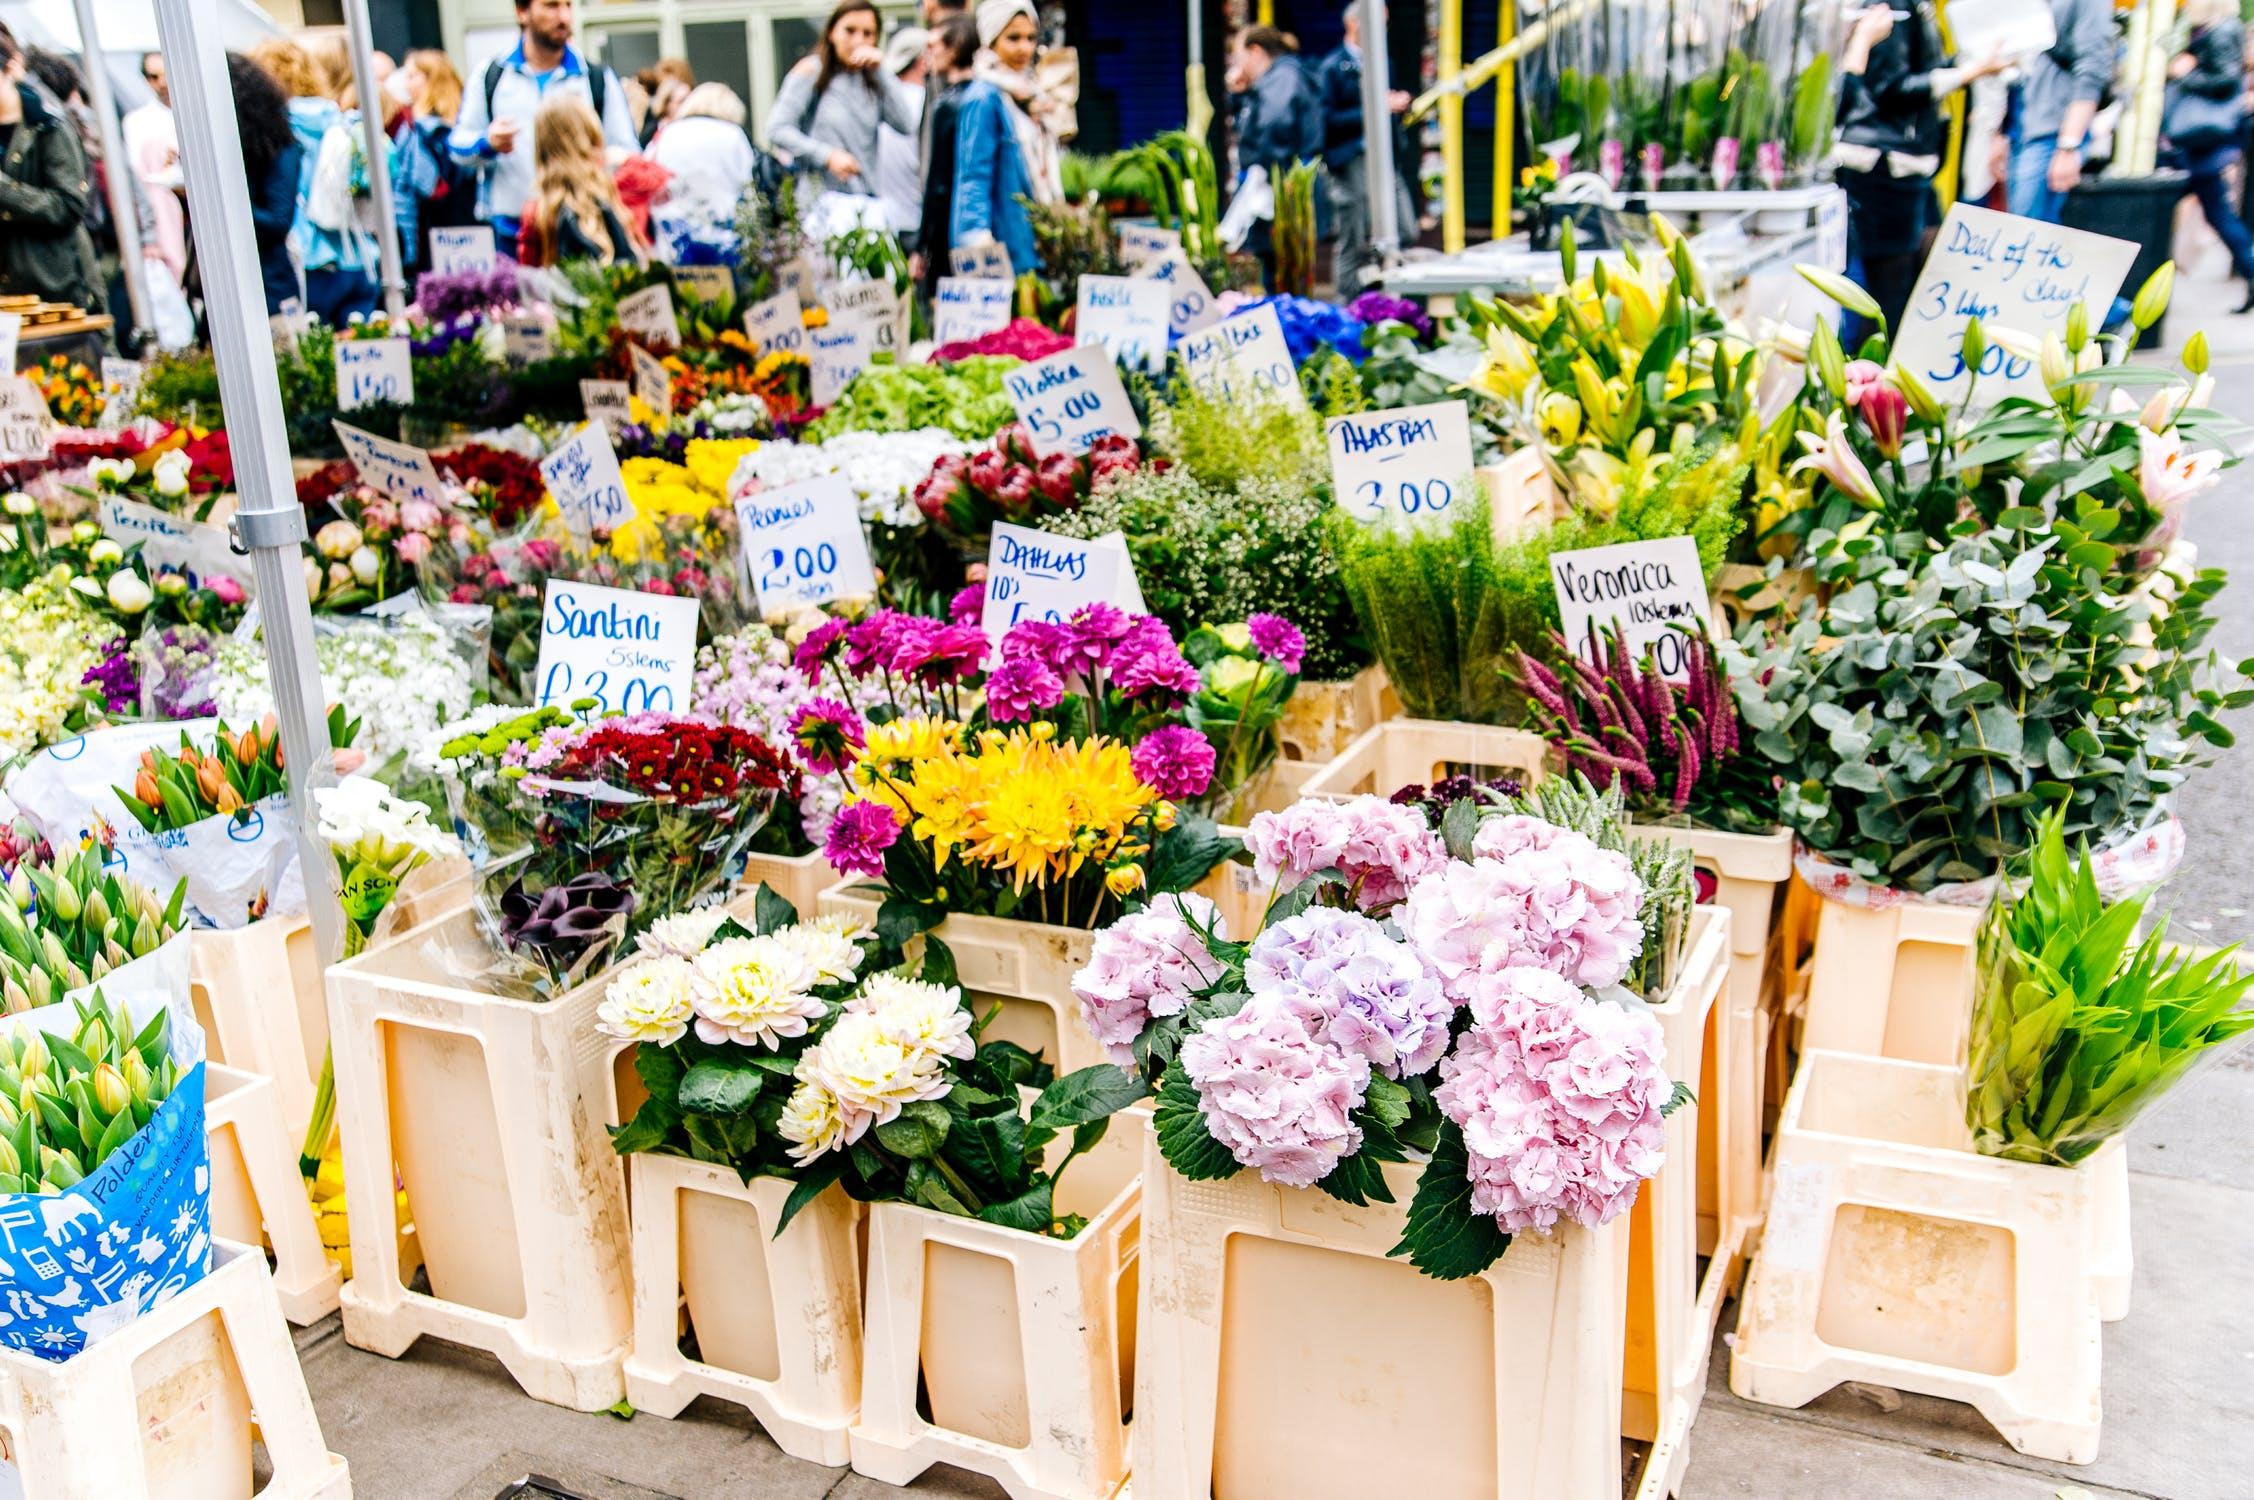 Flowers arranged in buckets at a flower market